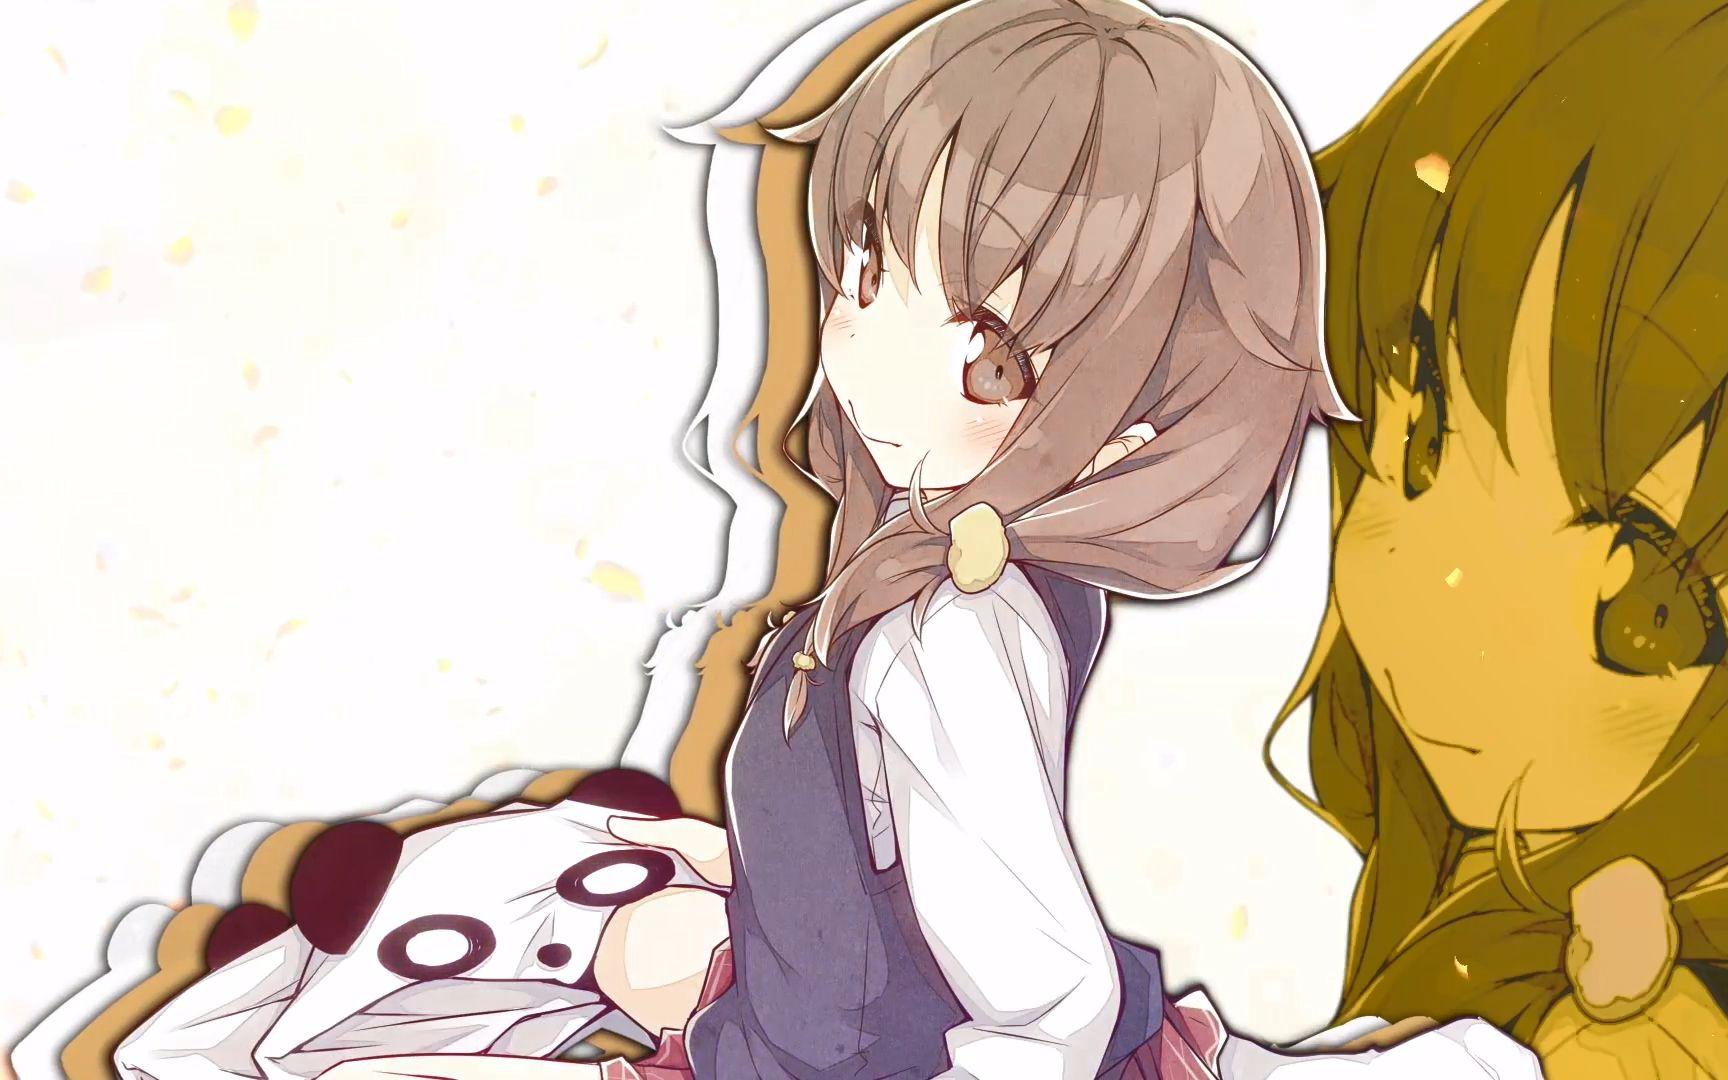 【10月】青春期笨蛋不做兔女郎學姐的夢 角色PV:梓川楓【輕萬】_嗶哩嗶哩 (゜-゜)つロ 干杯~-bilibili